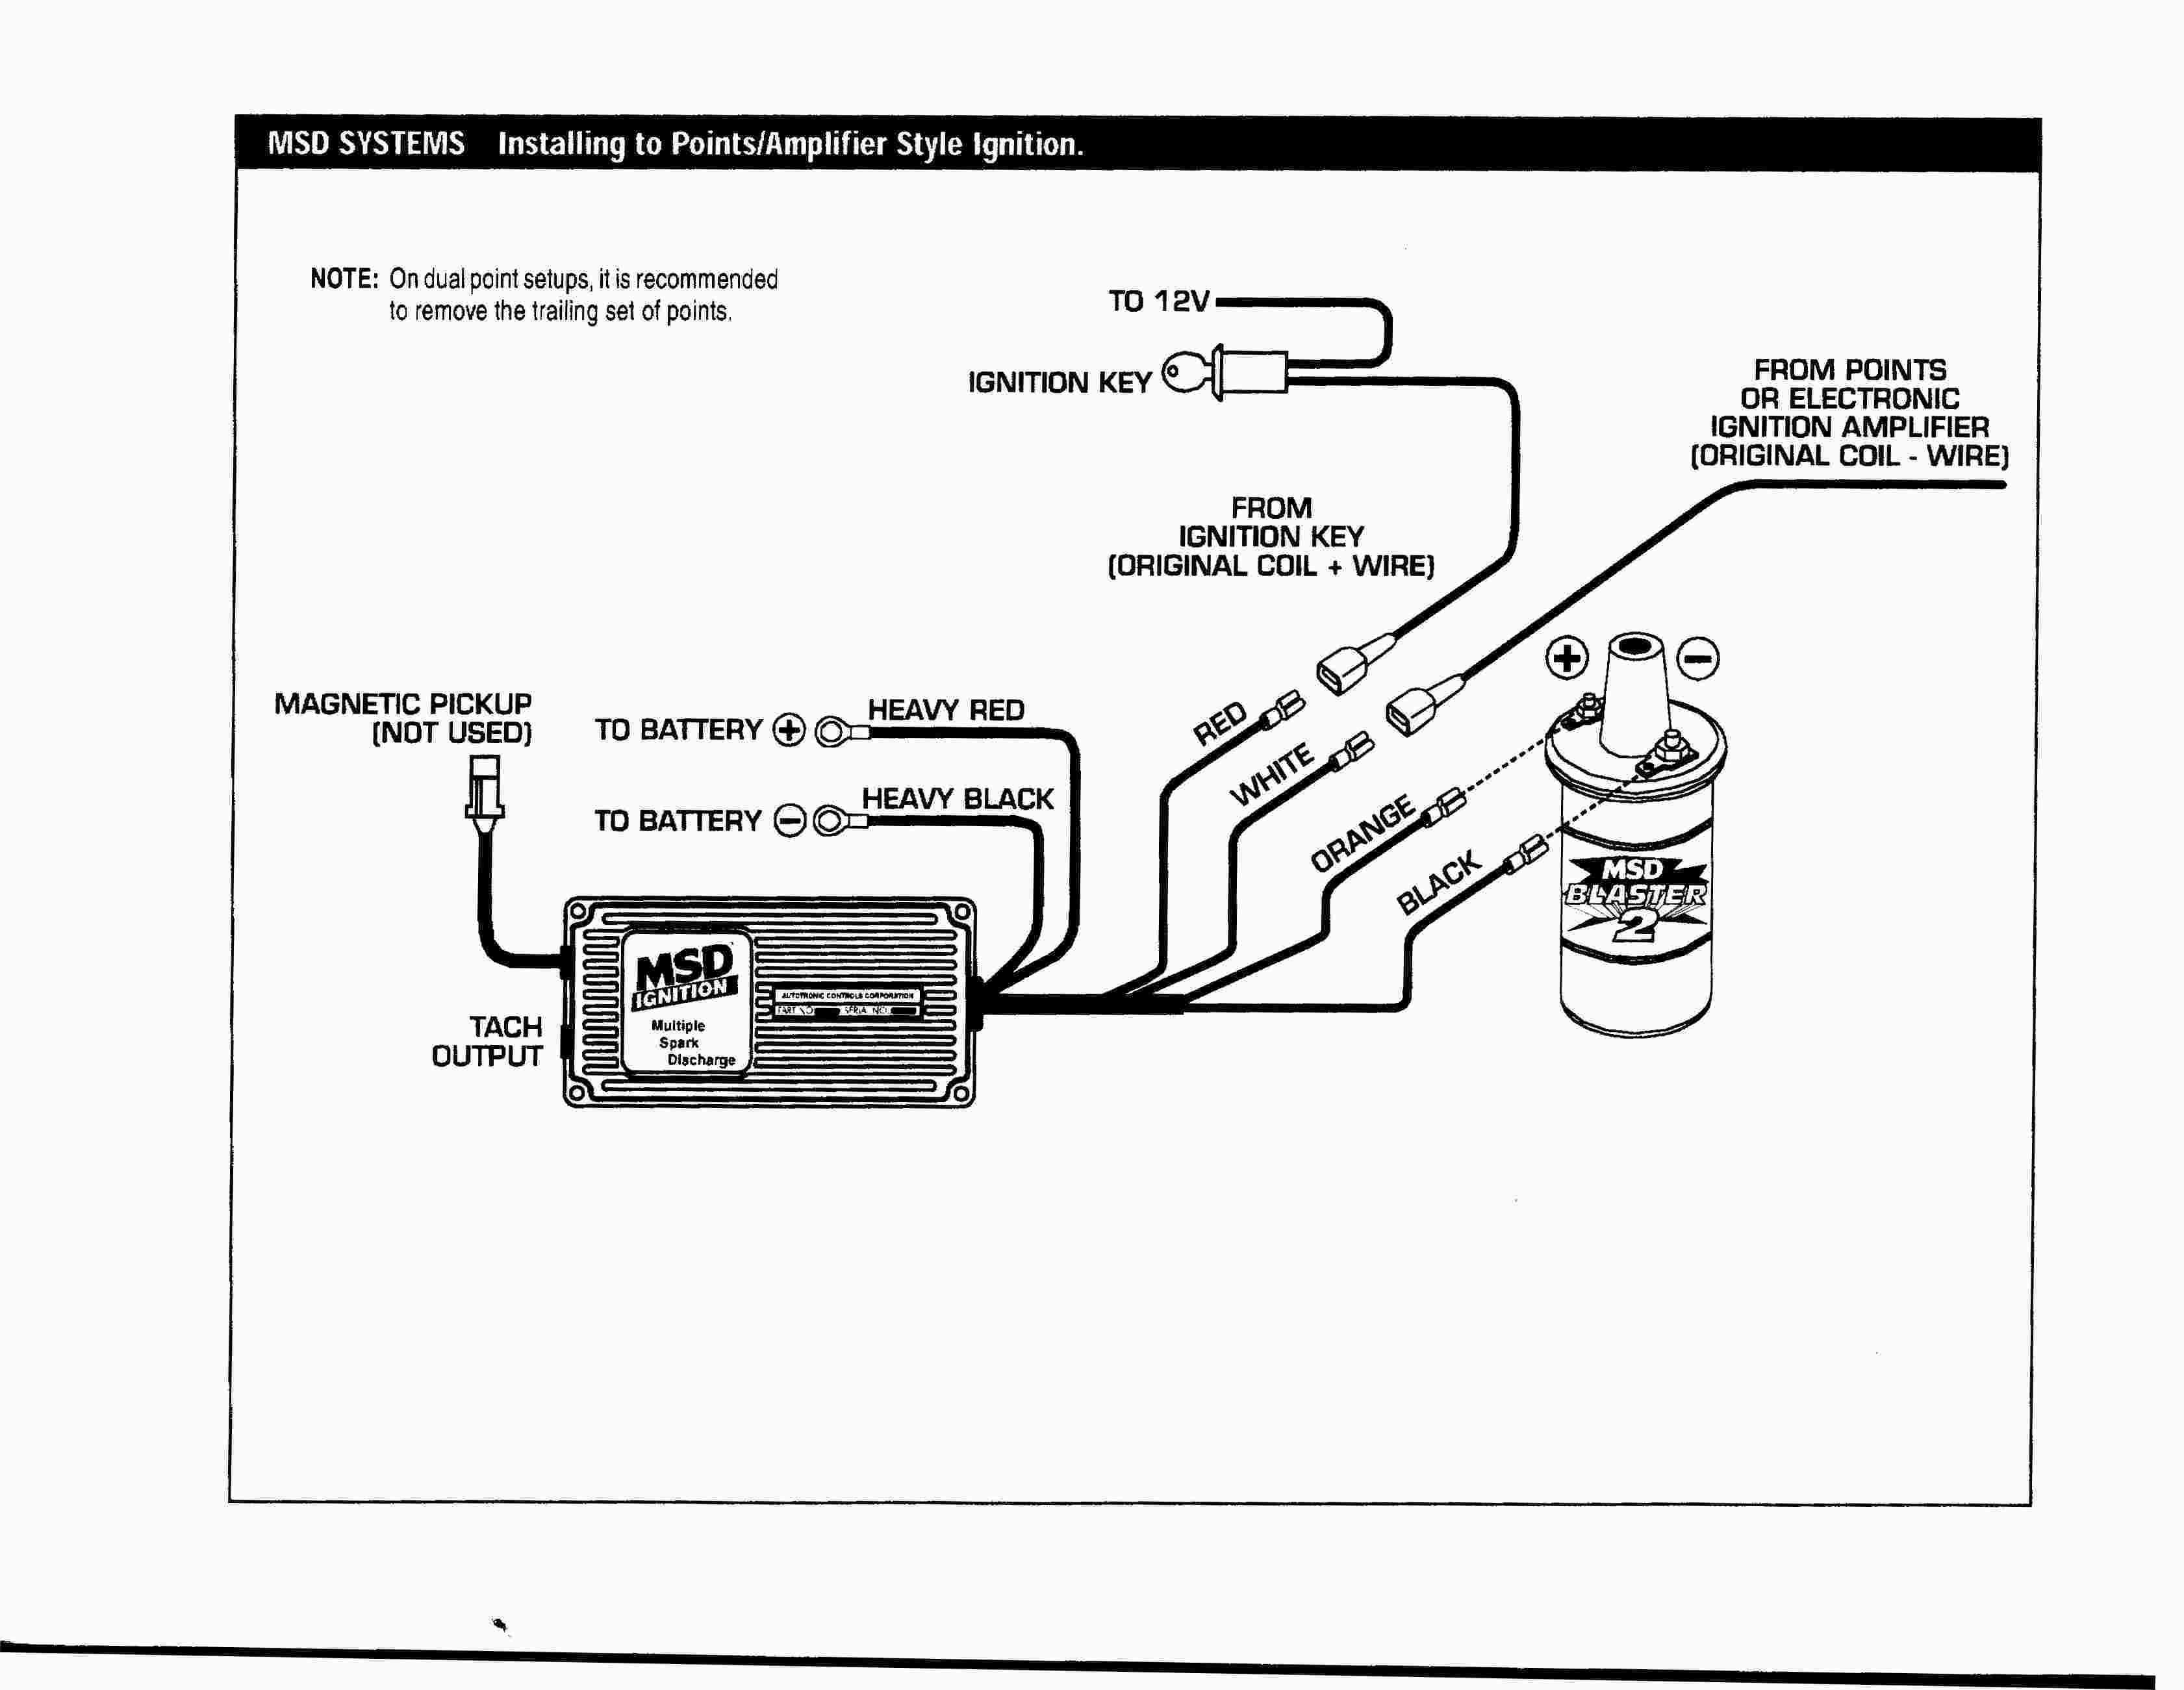 94 S10 Lt1 Swap Standalone Wiring Harness 6al Trusted Diagrams U2022 Rh Caribbeanblues Co 95 Parts 1995